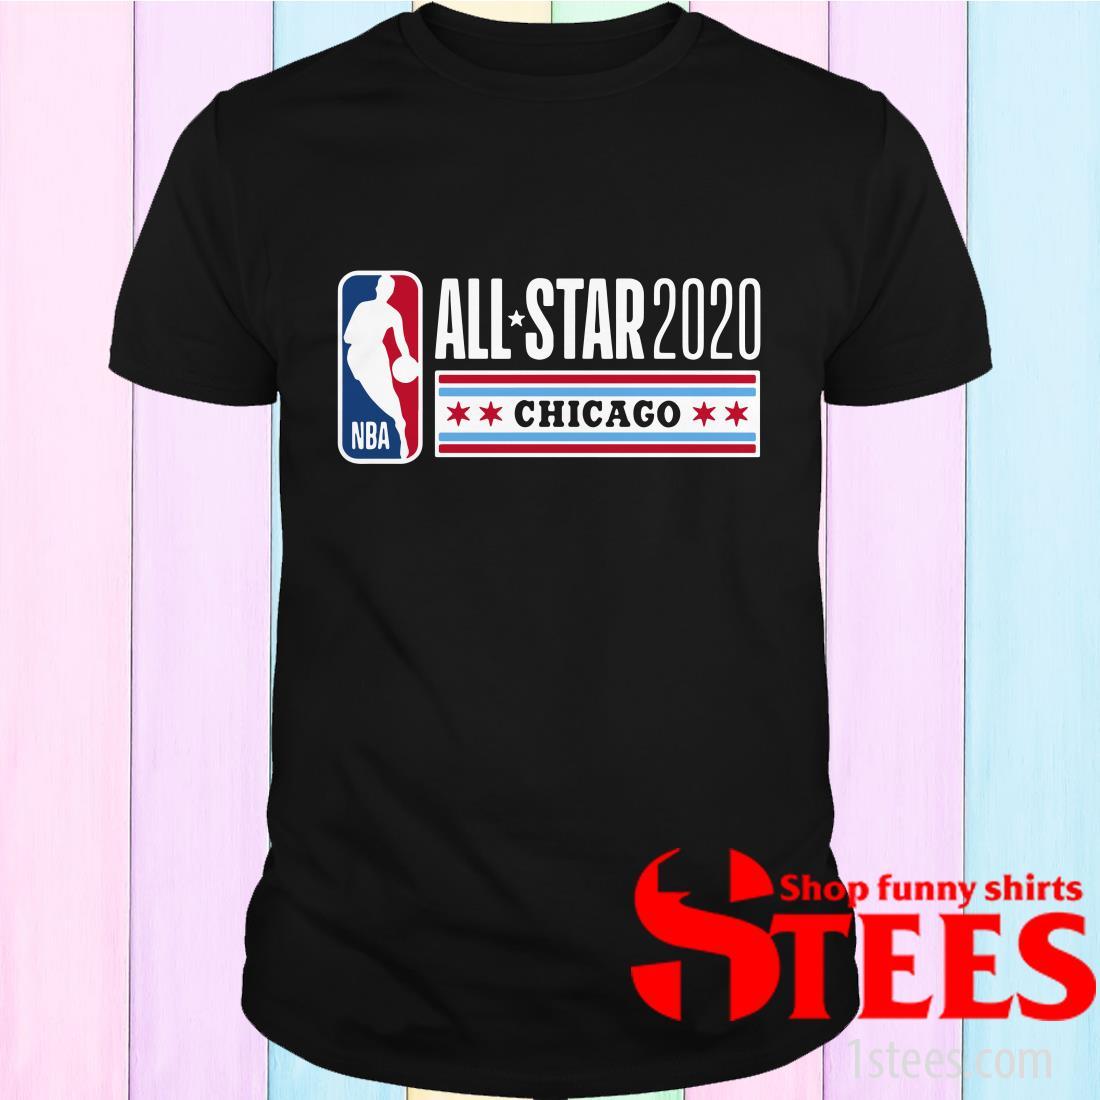 2020 Nba All Star Game Super Tee Shirt